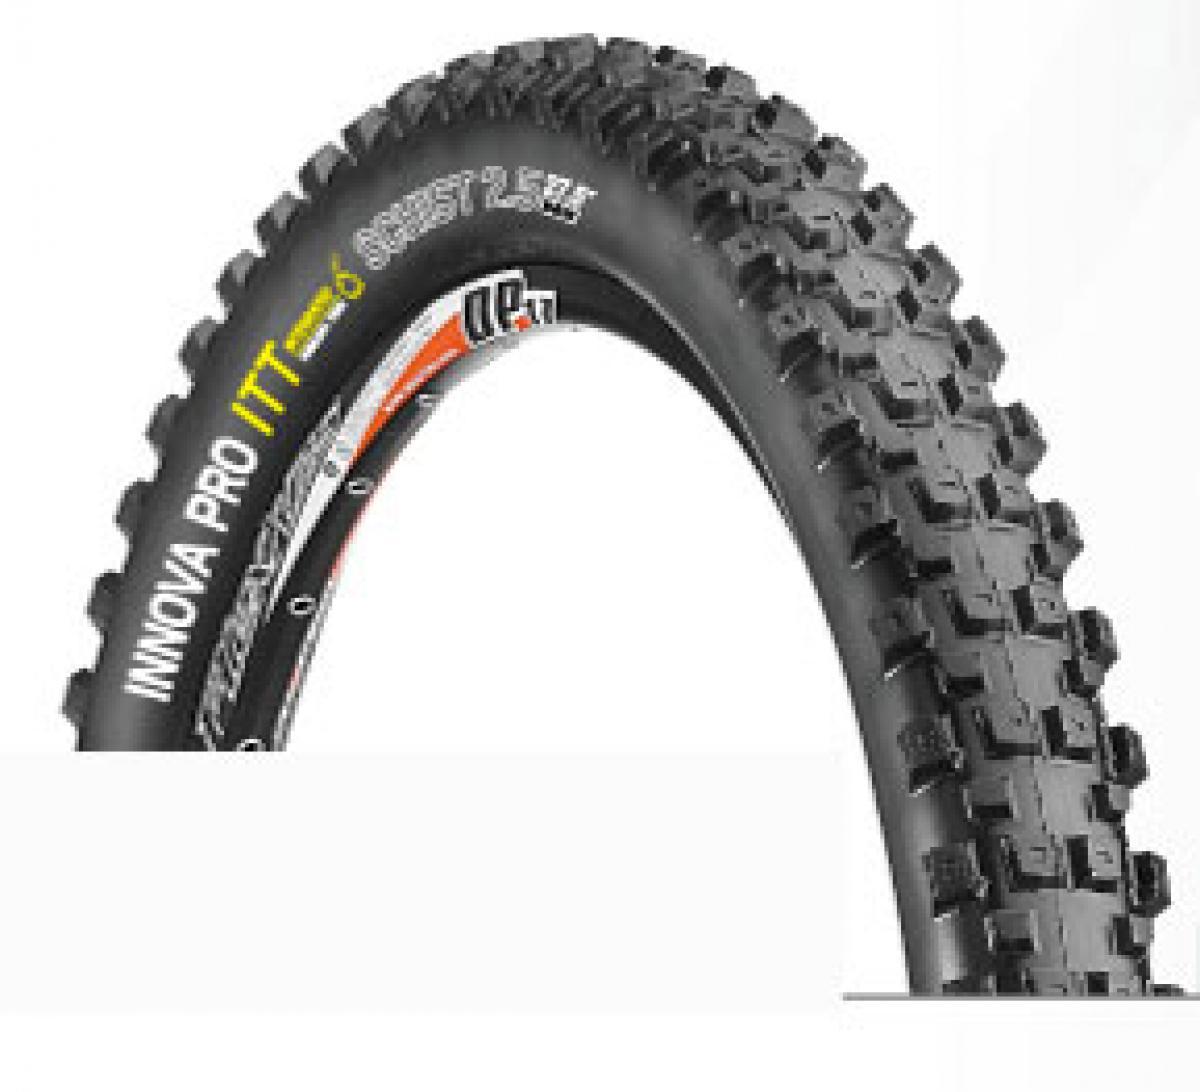 Inova Tore innova schist itt tire reviews mountain bike reviews